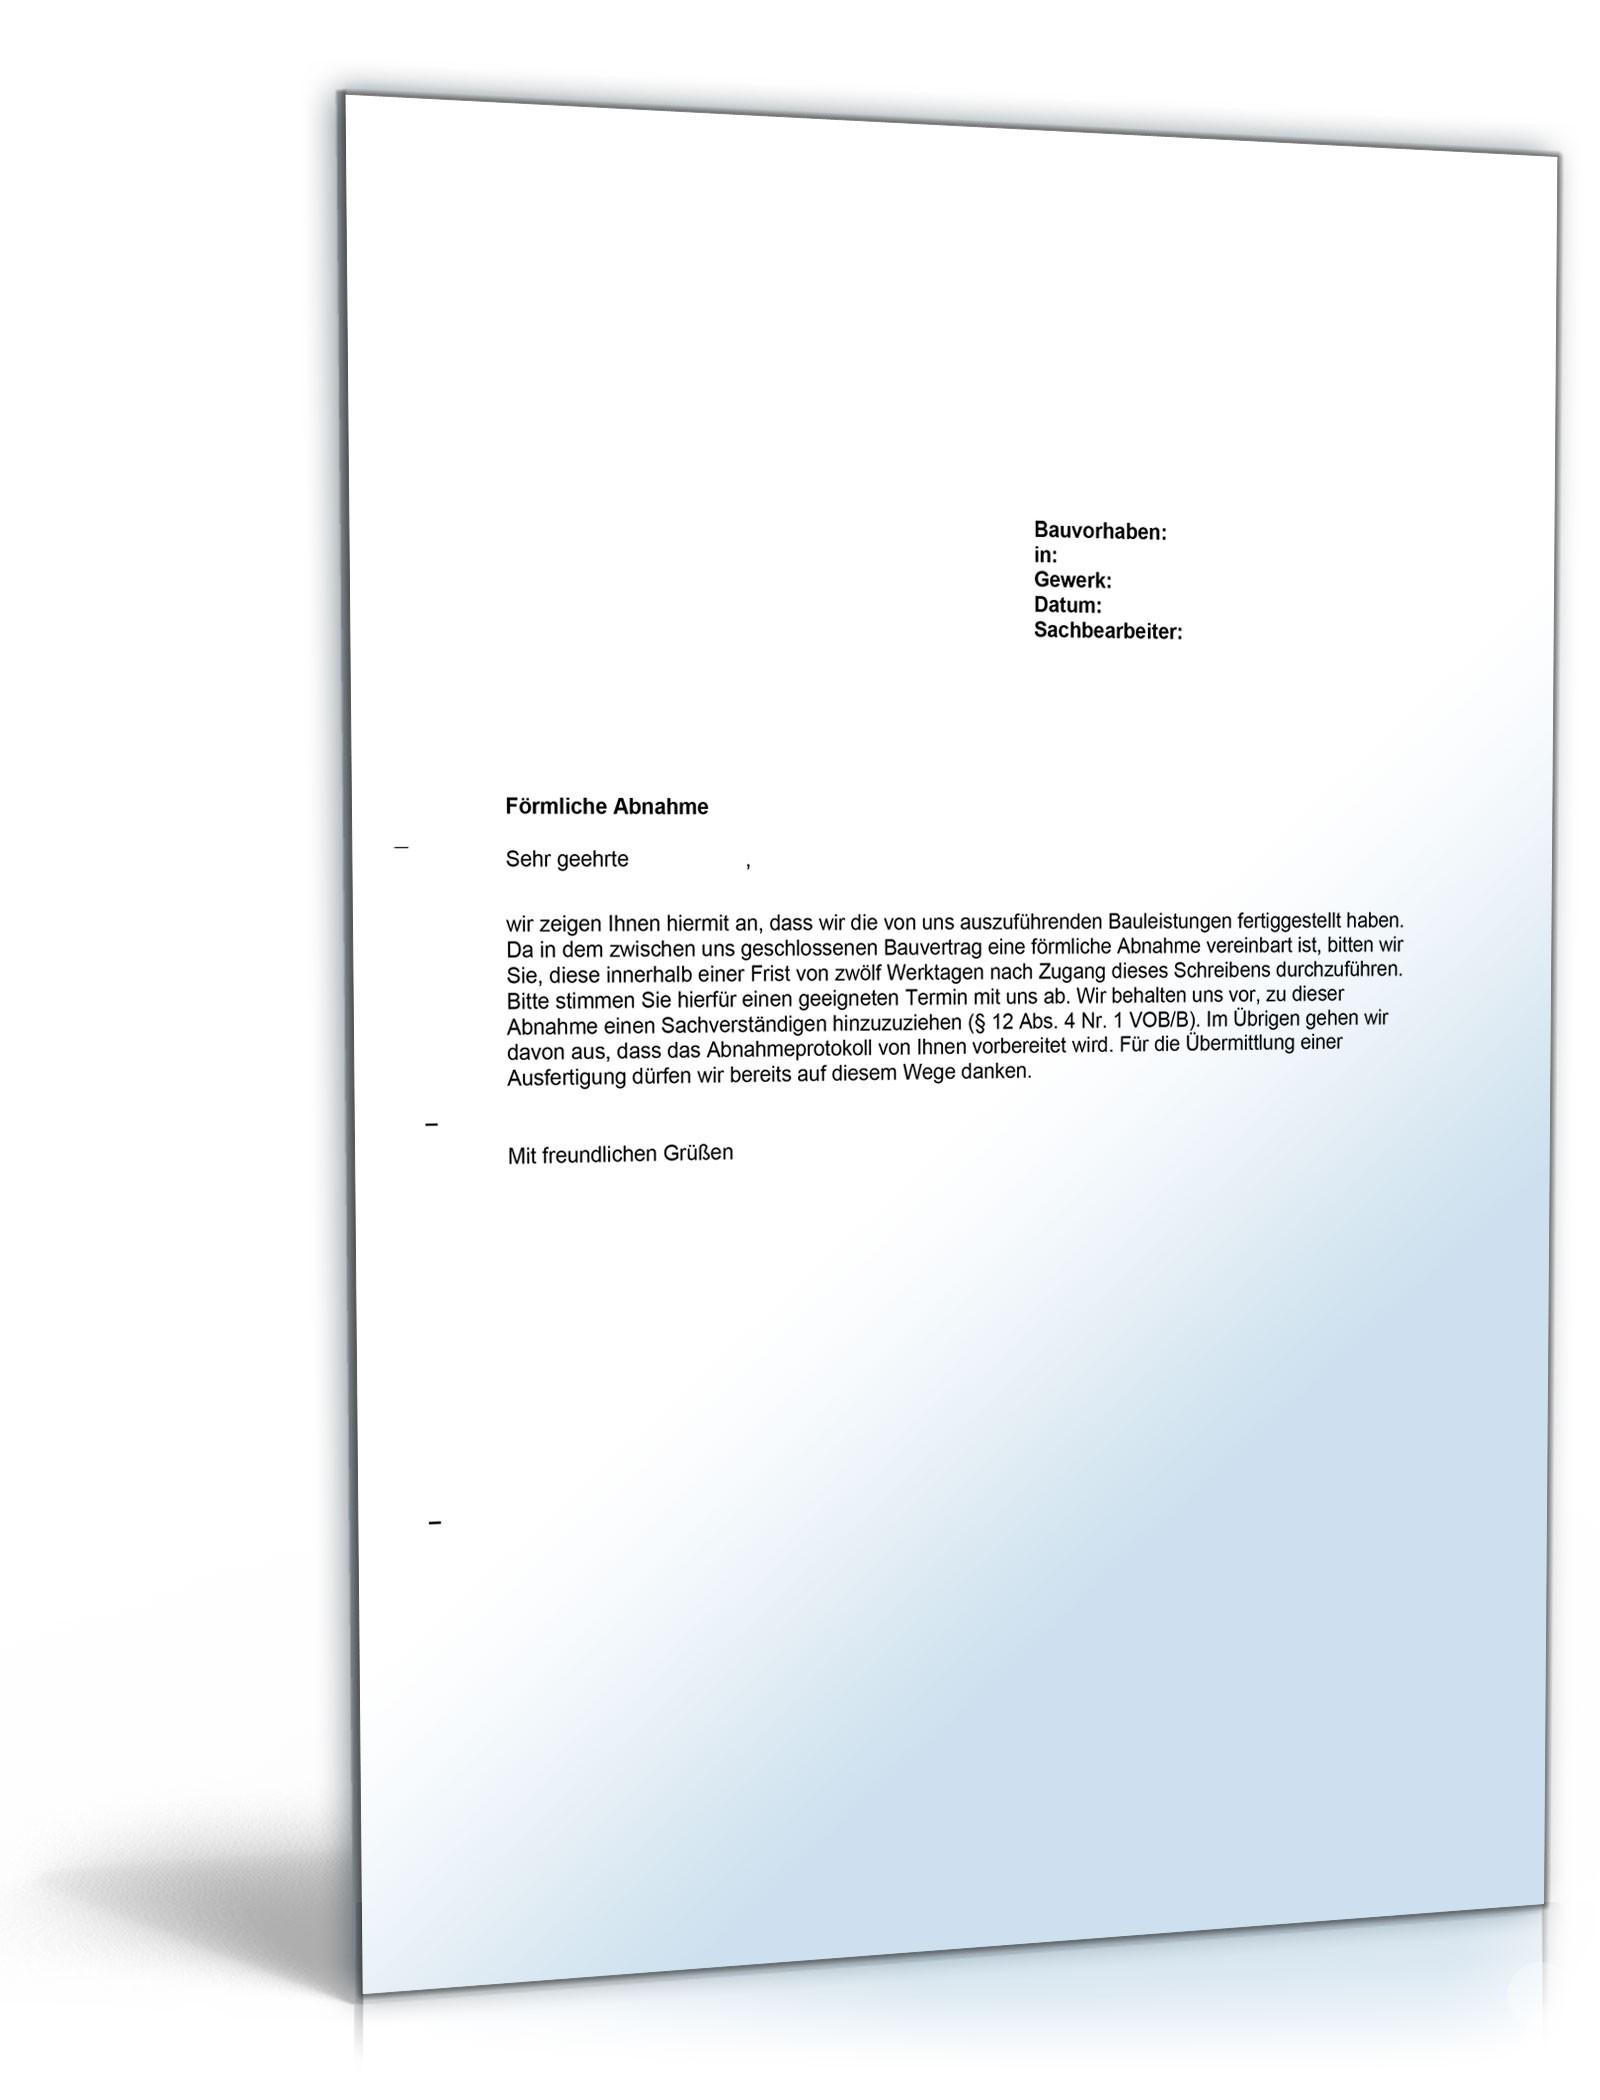 Charmant Rechtssekretärin Australien Ideen - Entry Level Resume ...